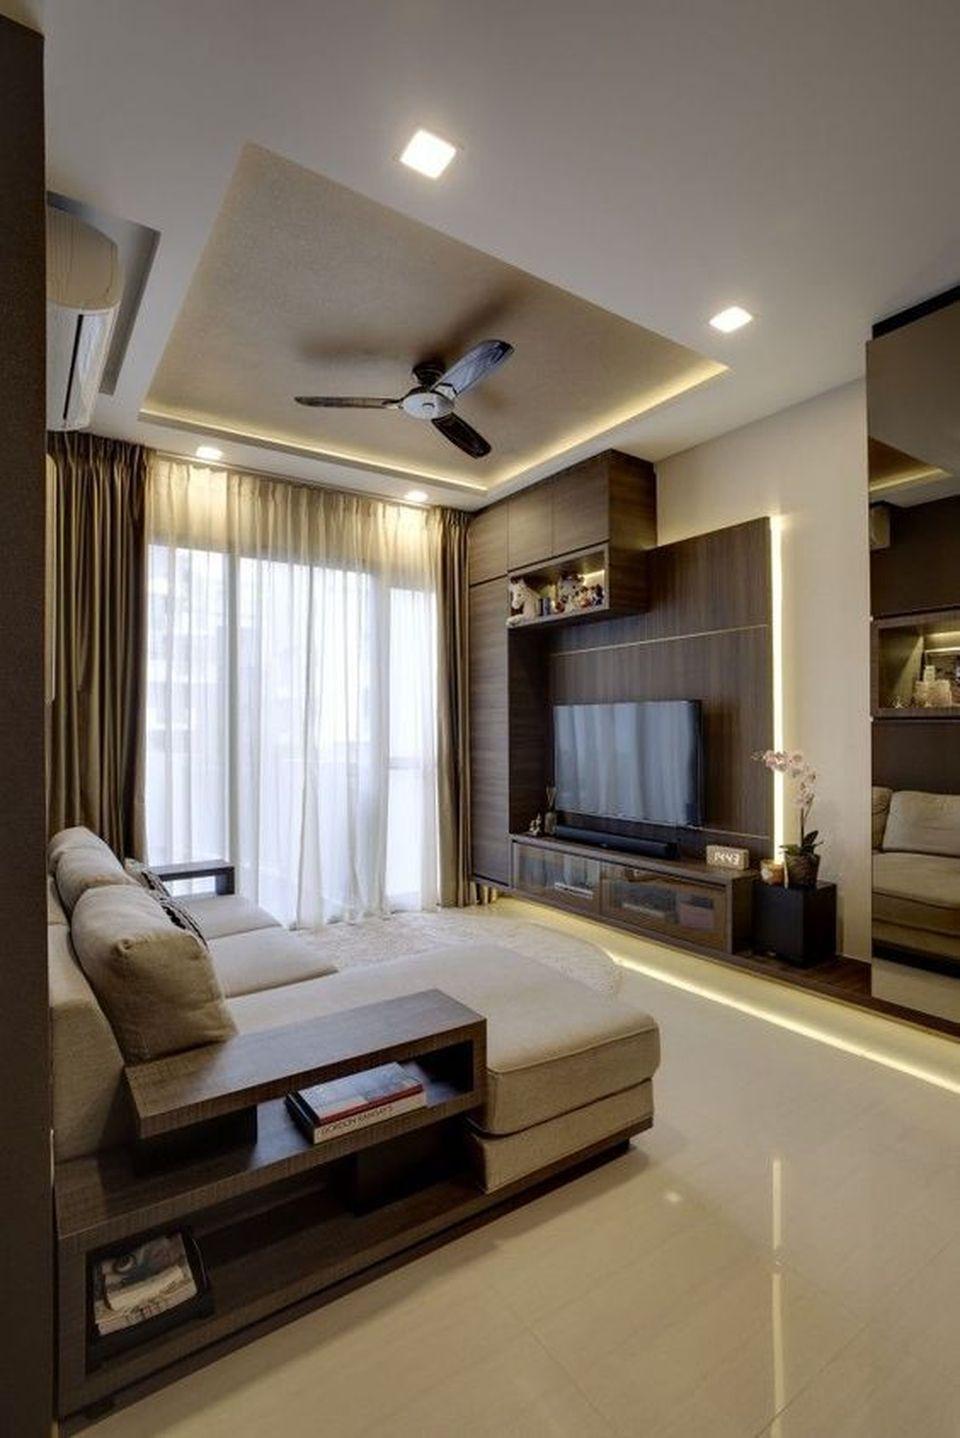 70 Modern False Ceilings with Cove Lighting Design for